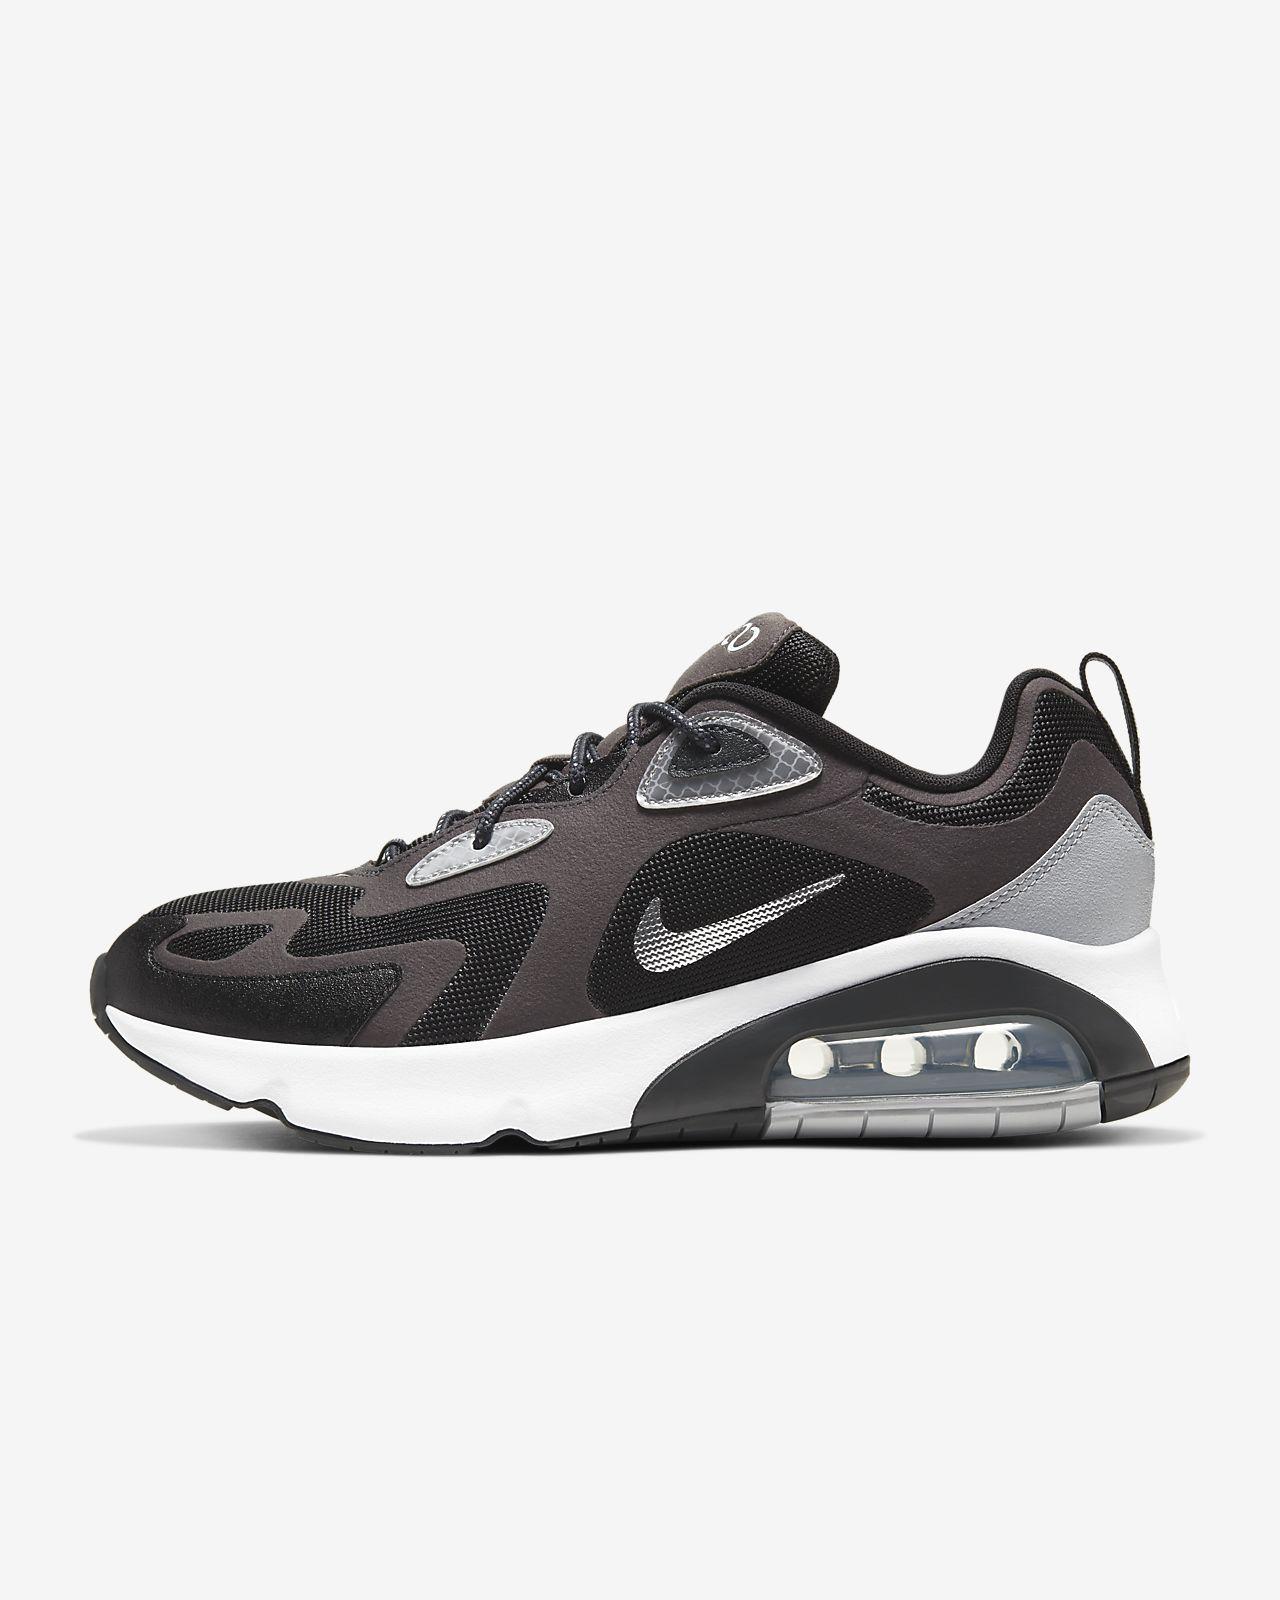 Nike Air Max Bold Running Shoes